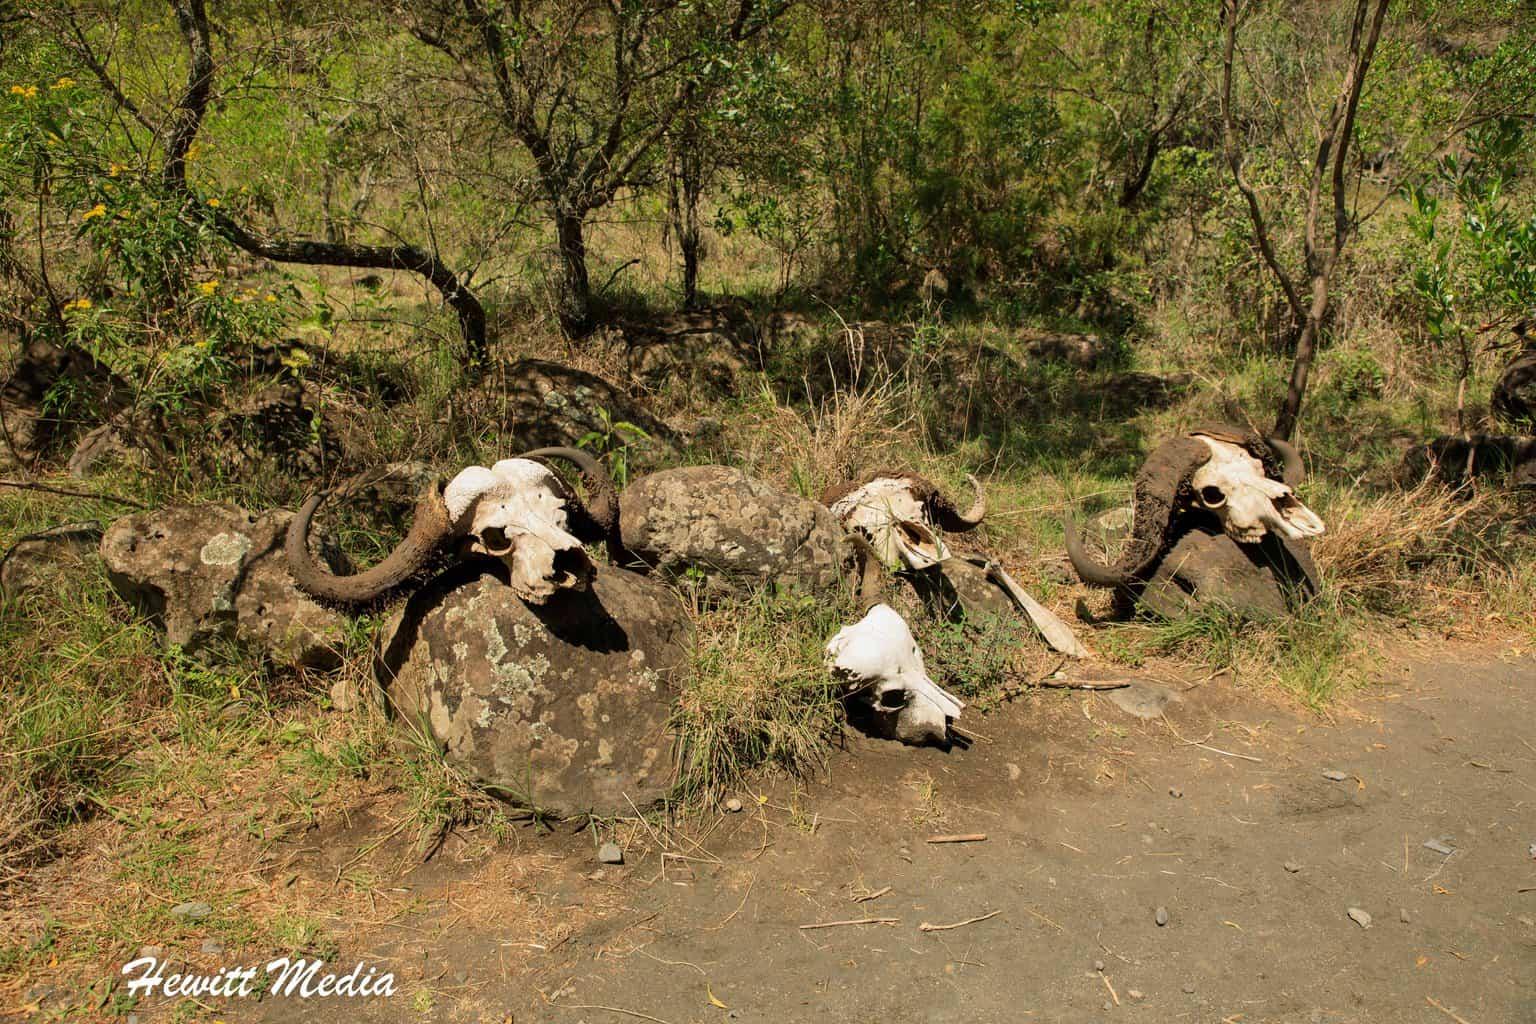 Animal skulls found in Arusha National Park